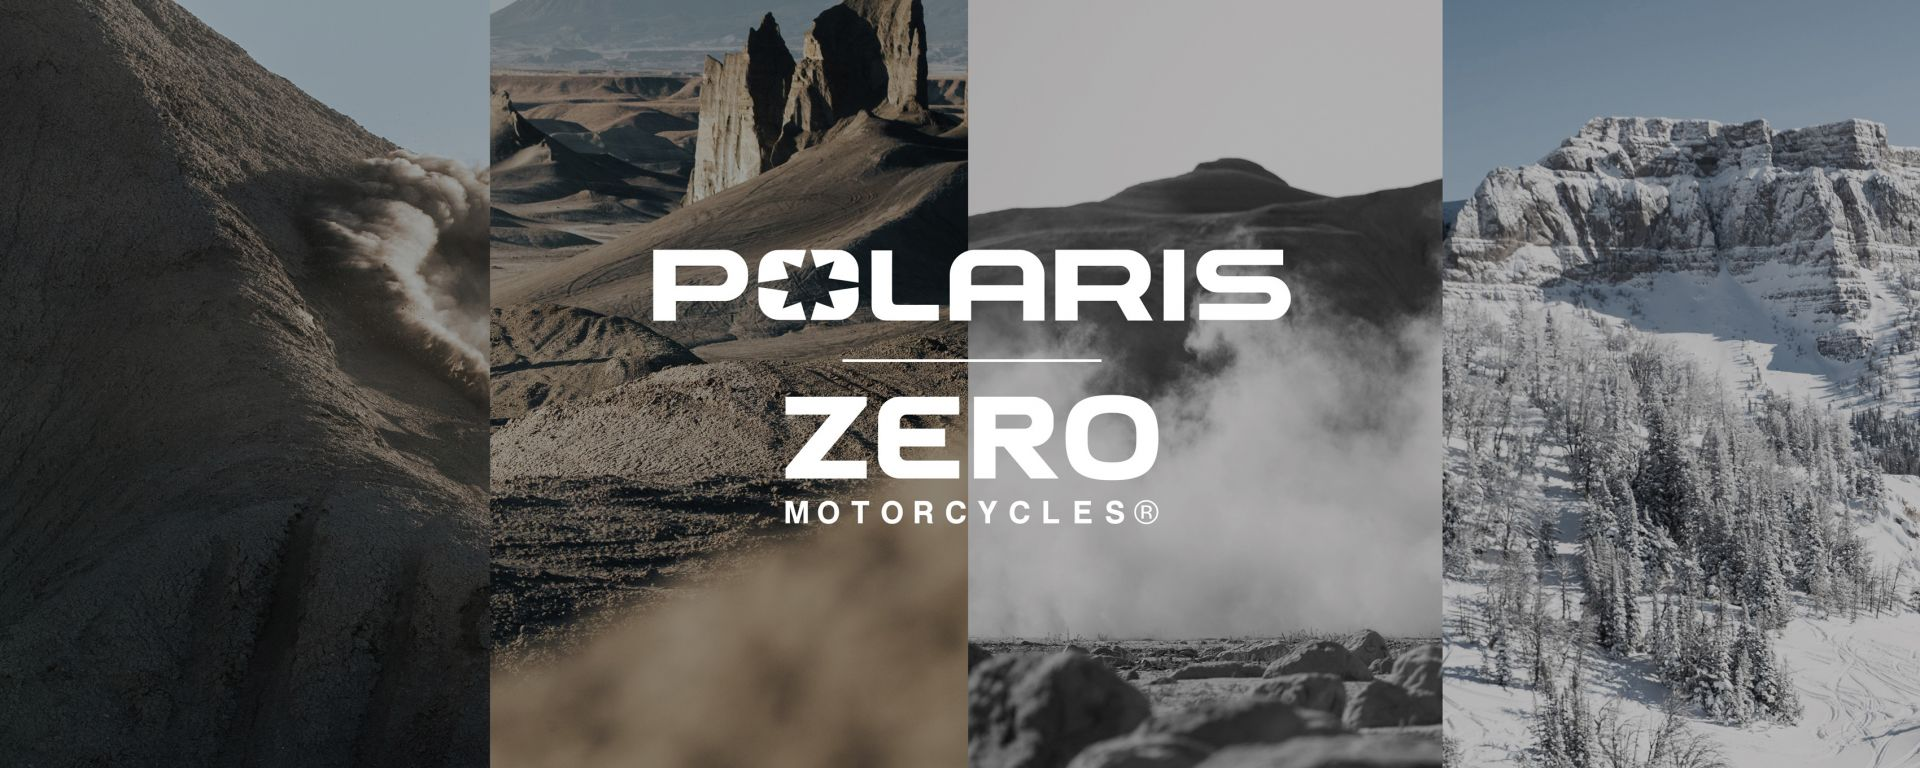 Polaris e Zero Motorcycles insieme fino al 2030